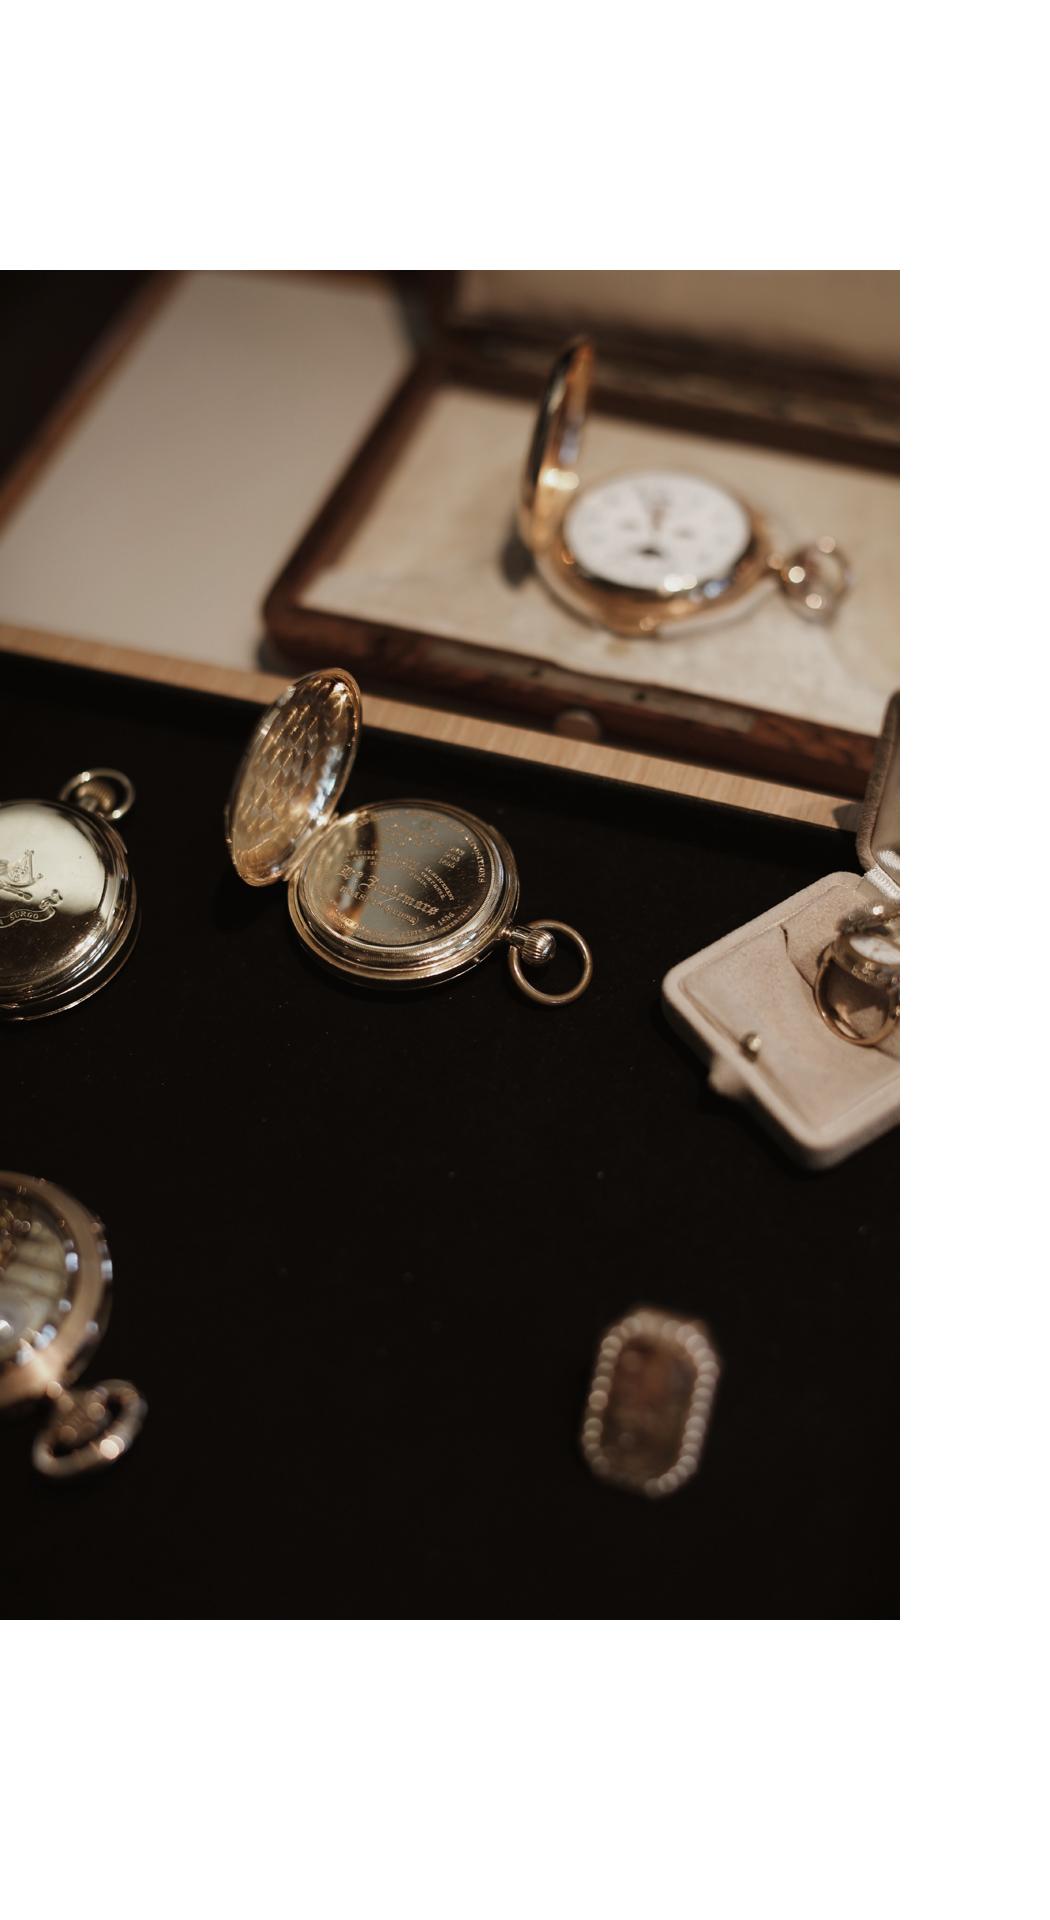 A visual Story: Audemars Piguet Manufacture Visit - by Fiona Dinkelbach